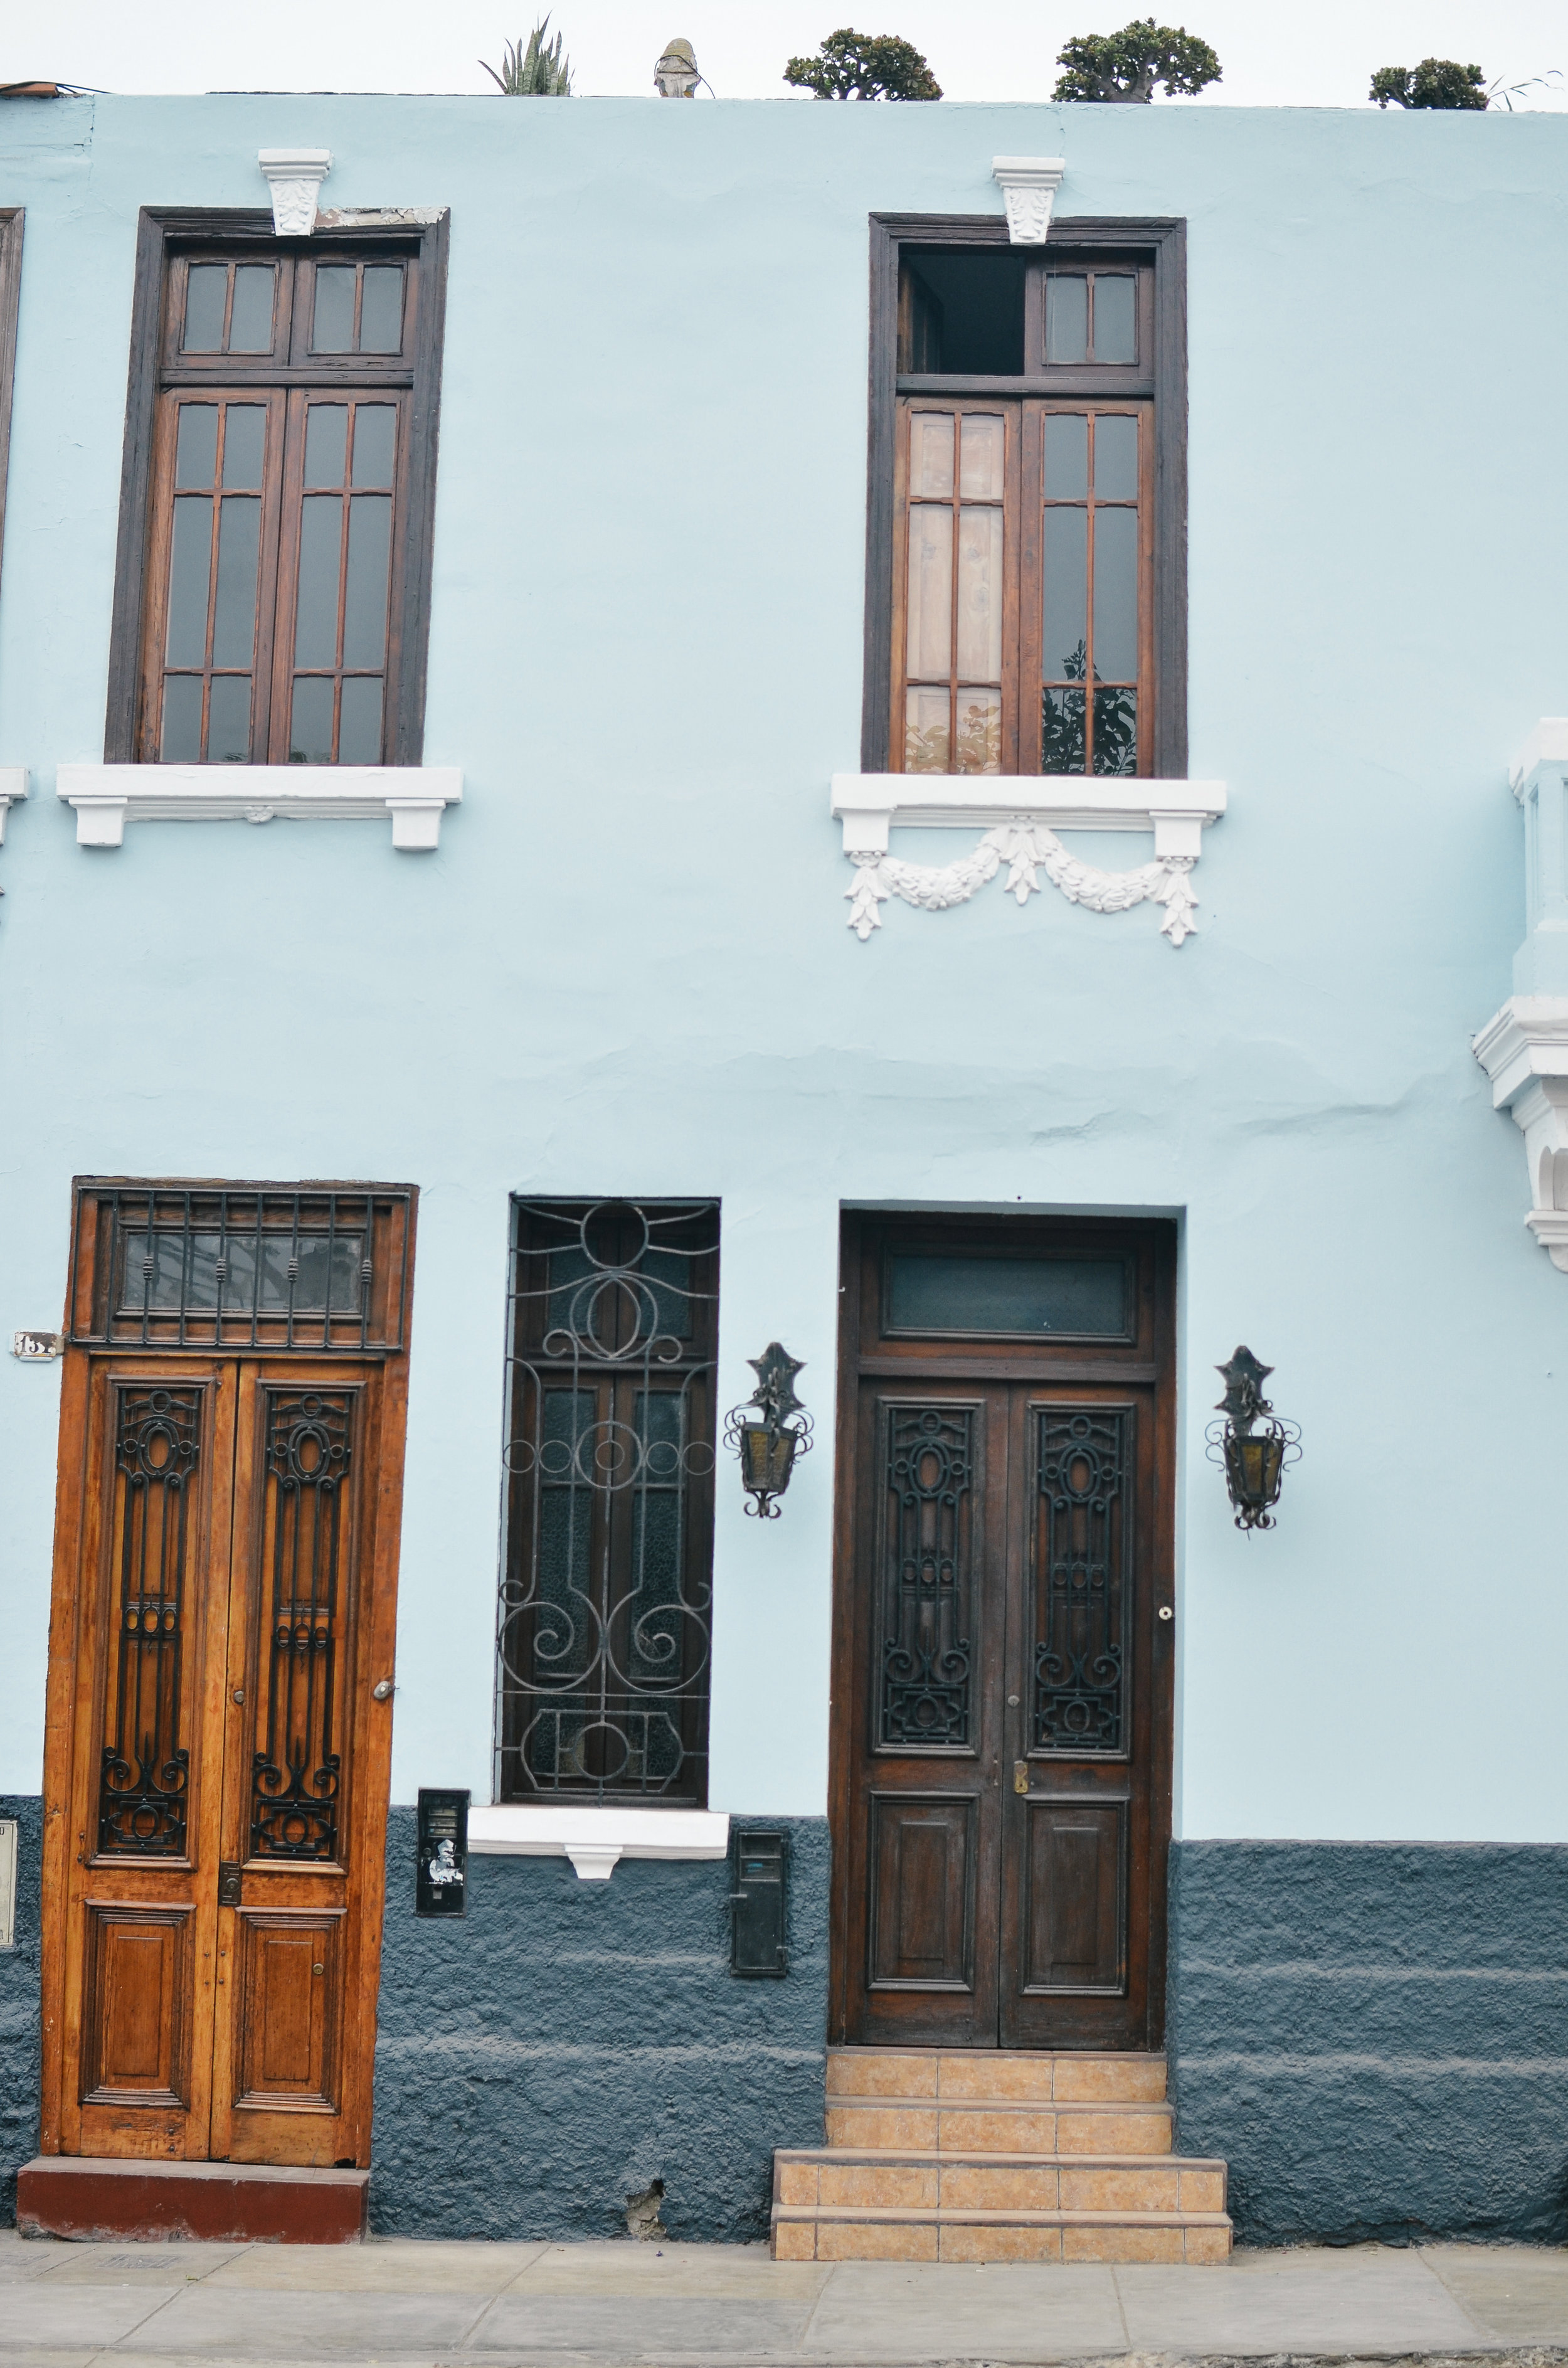 lima+peru+travel+guide+life+on+pine+blog +exchange_DSC_0069.jpg